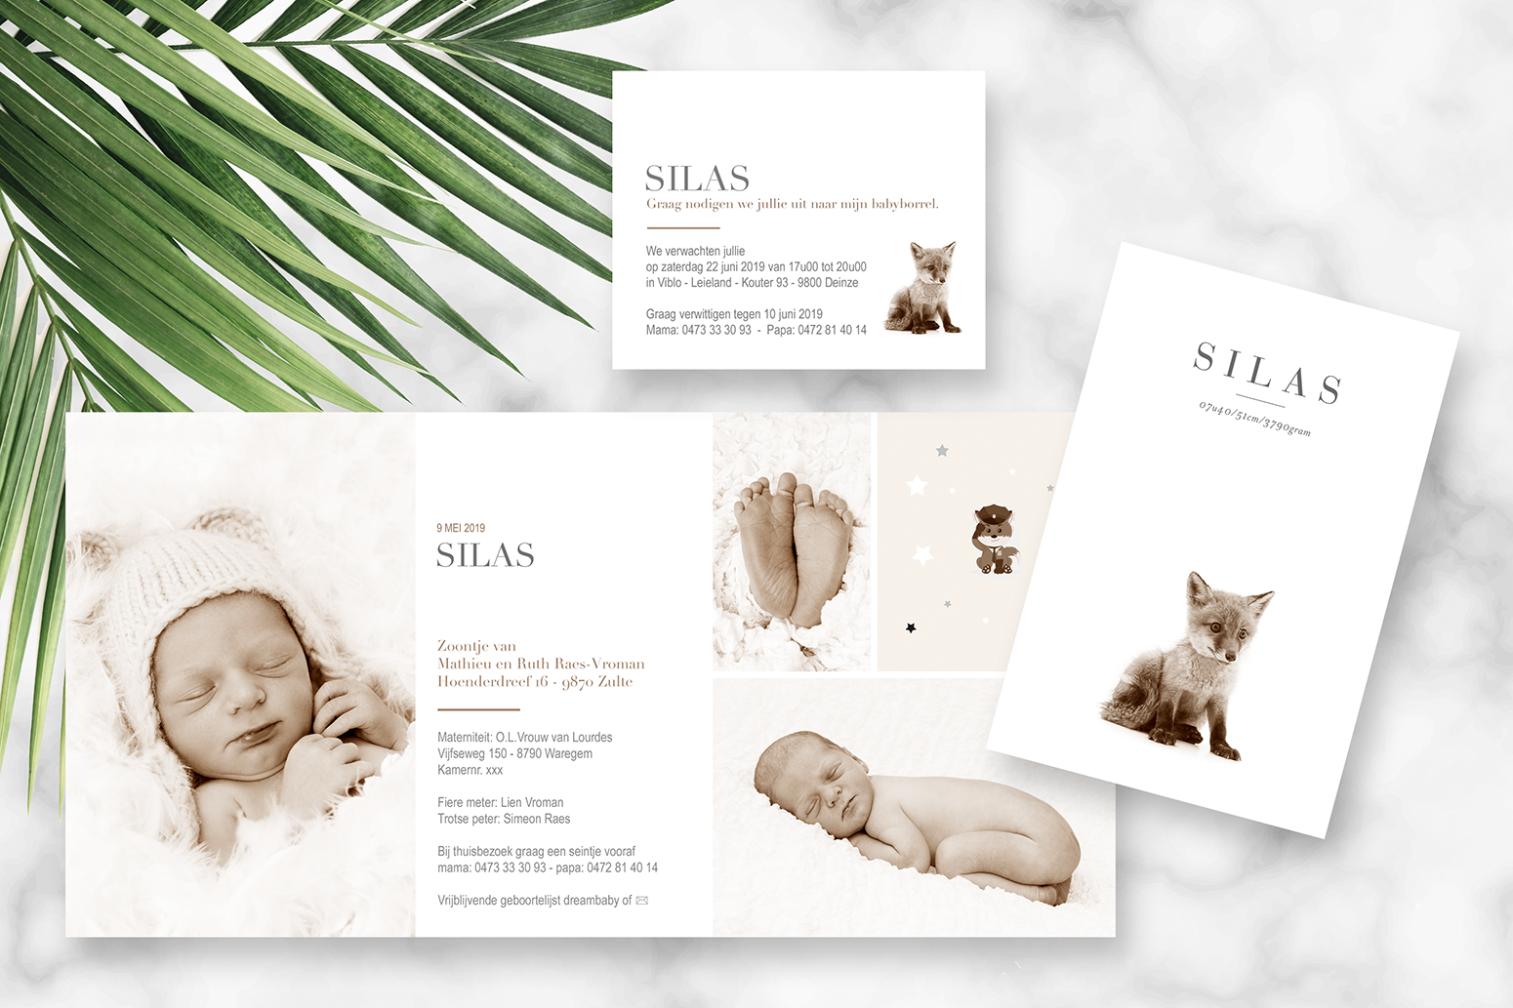 Geboortekaartje met foto van Silas